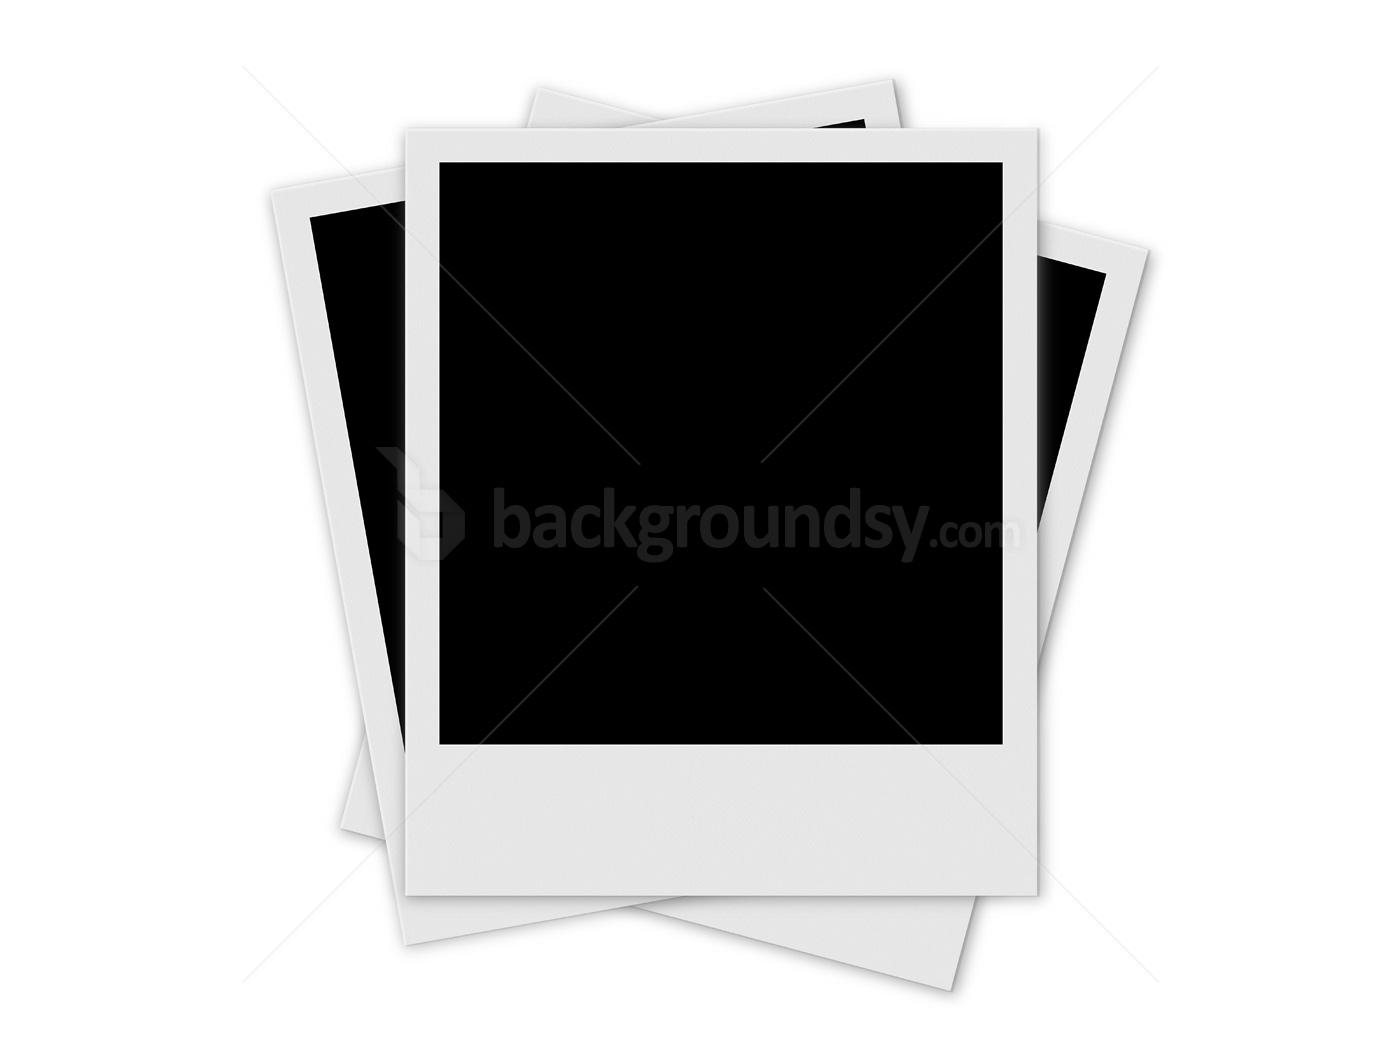 polaroid frames backgroundsy com